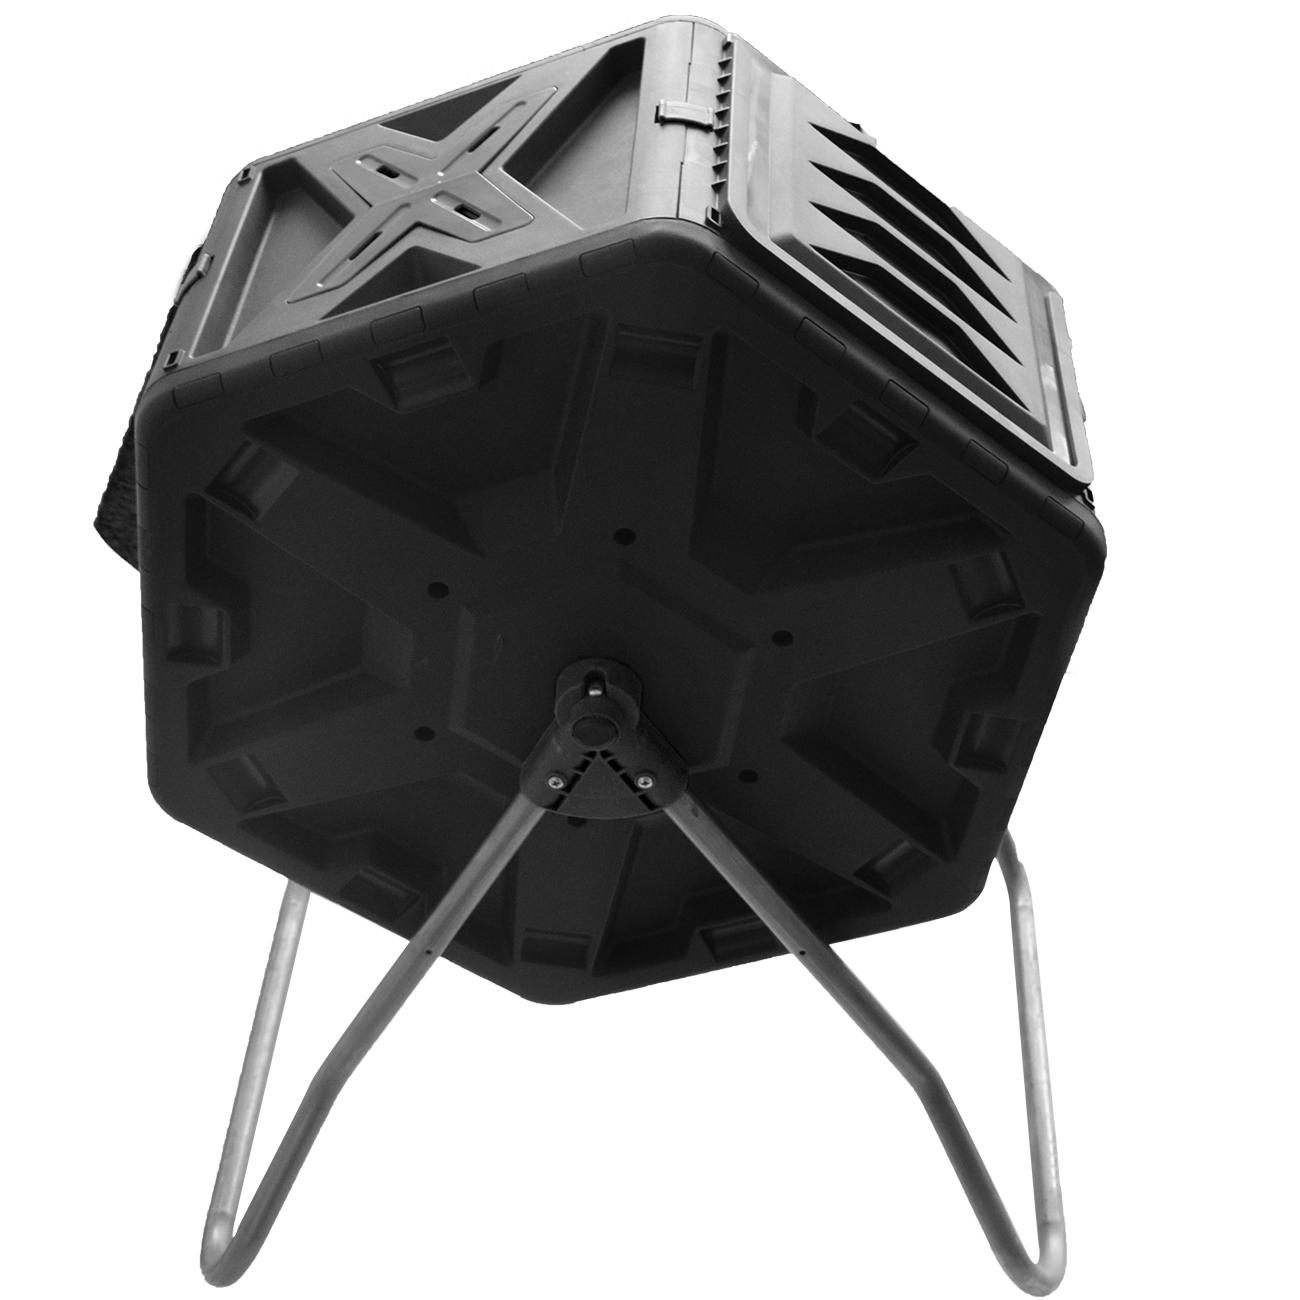 MAZE 70L Tumble Composter